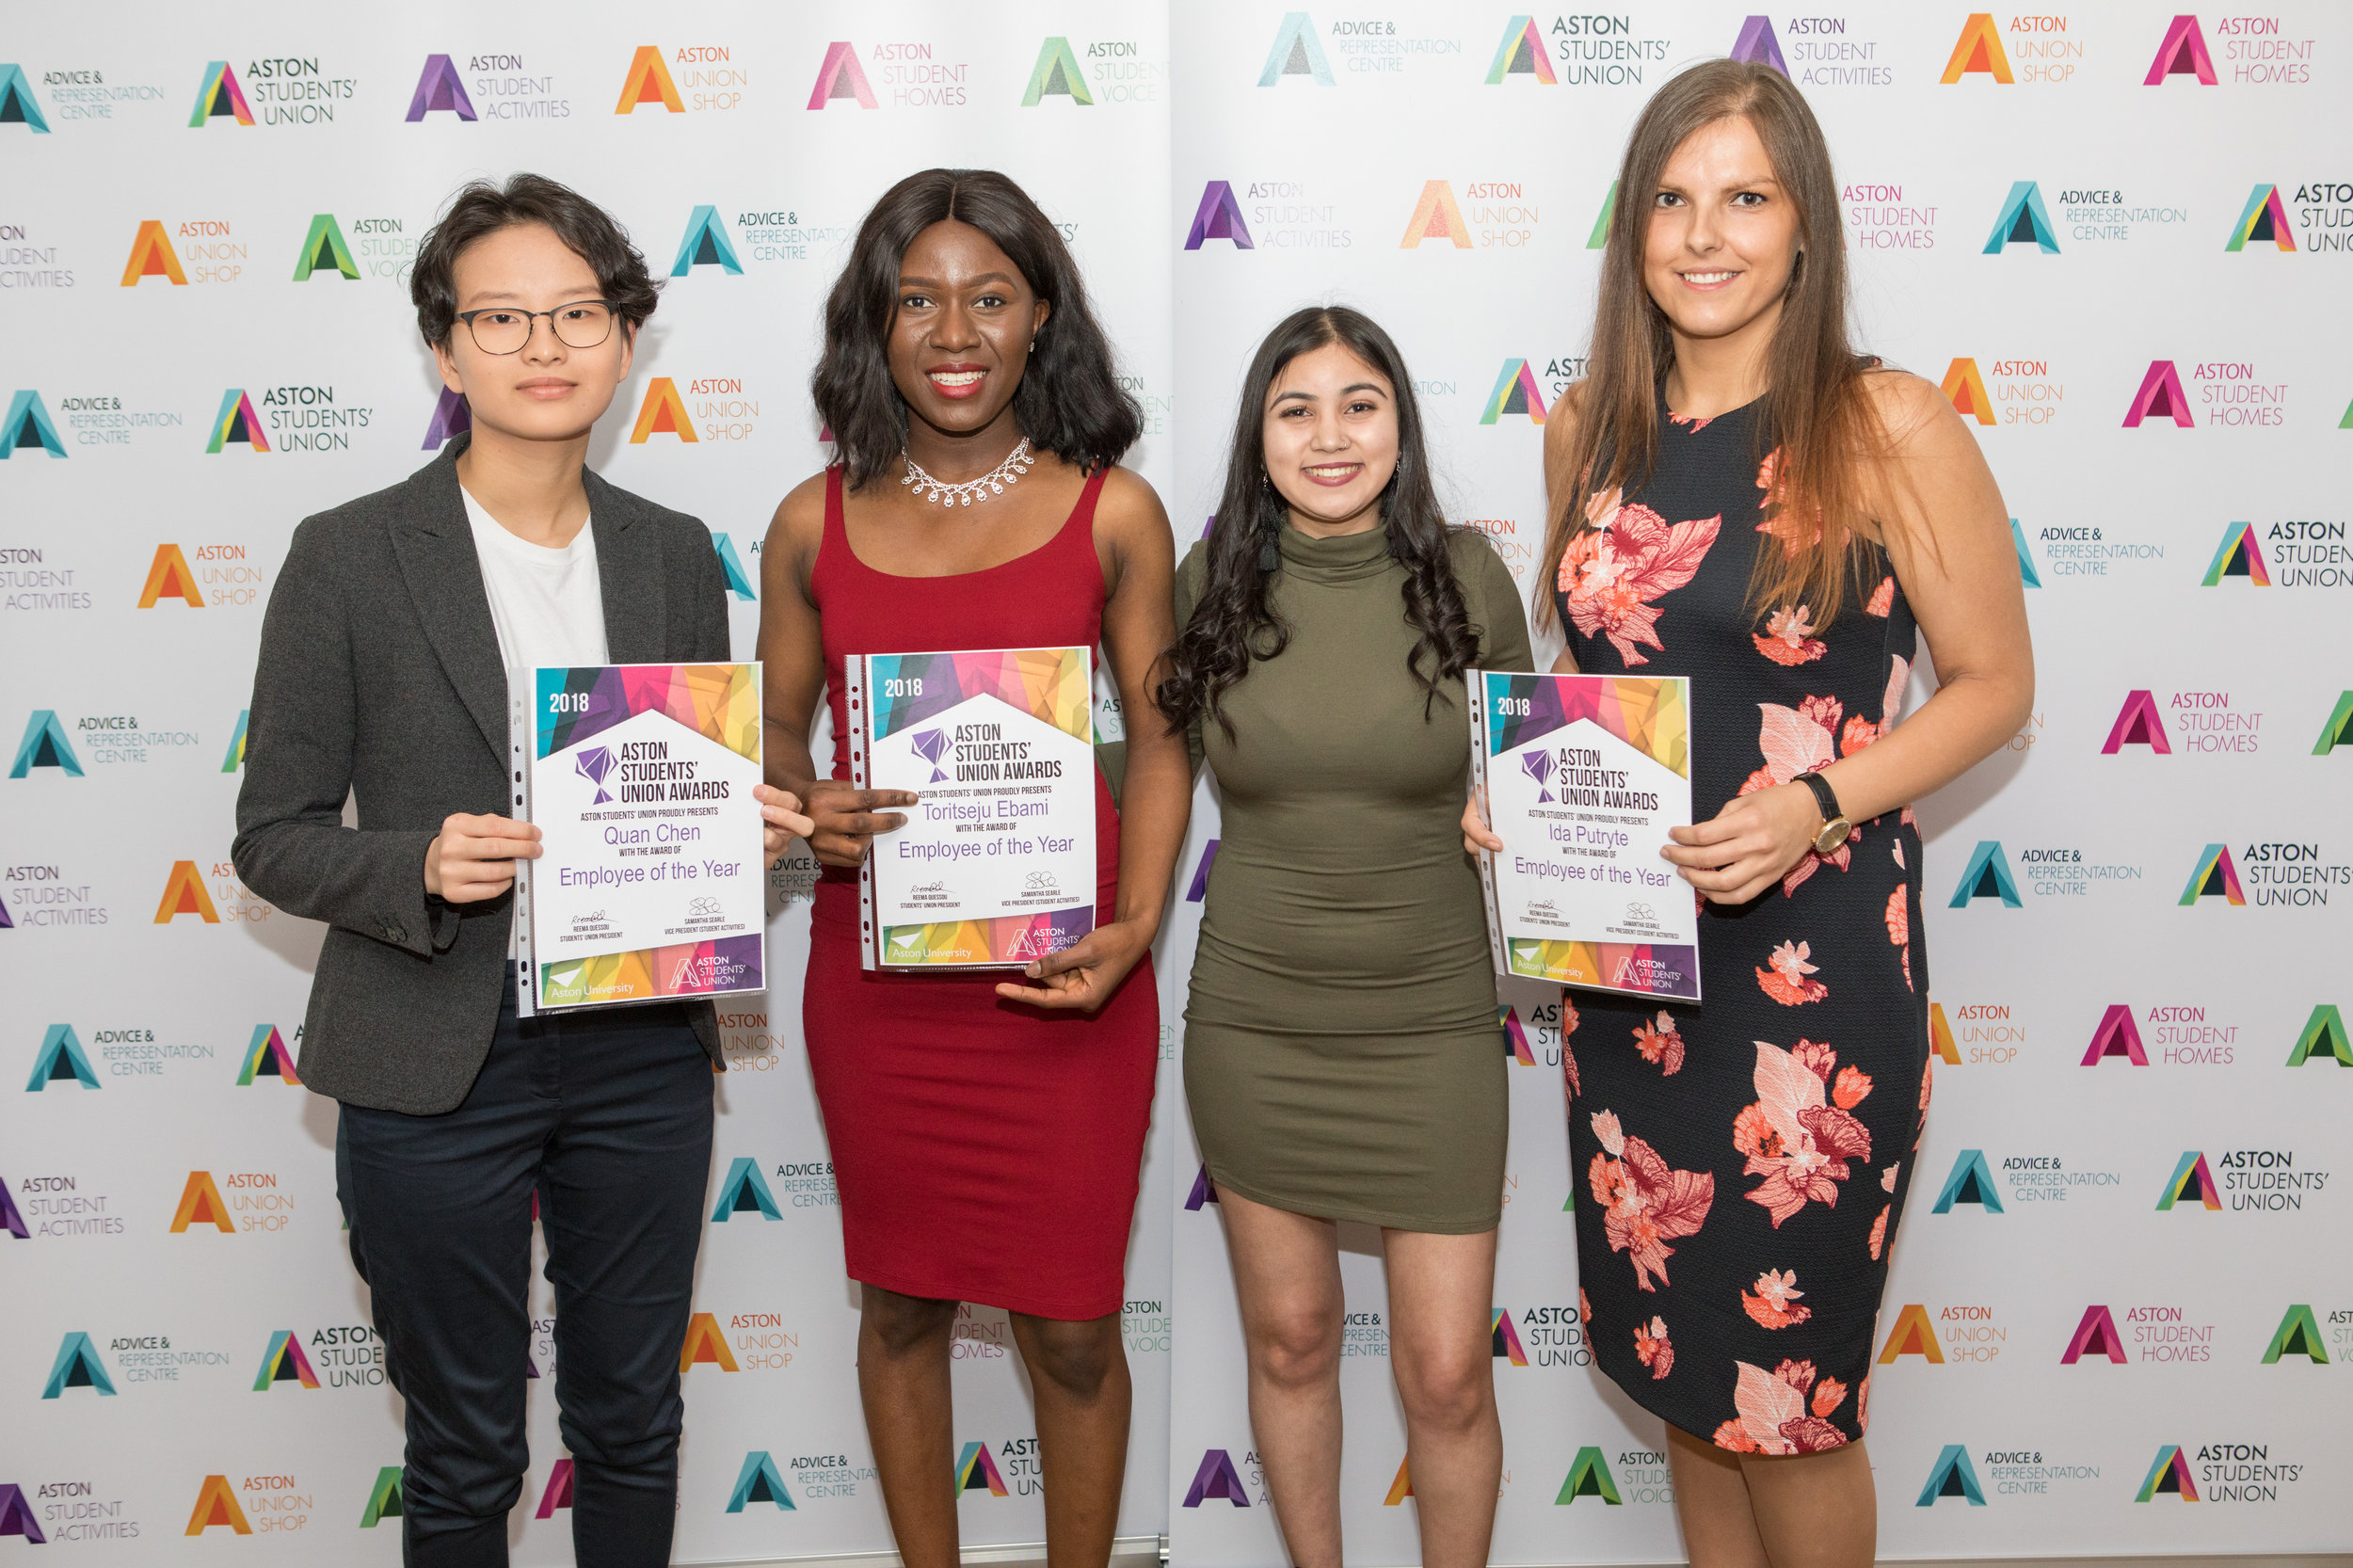 ASU Awards 03-05-2018.jpg